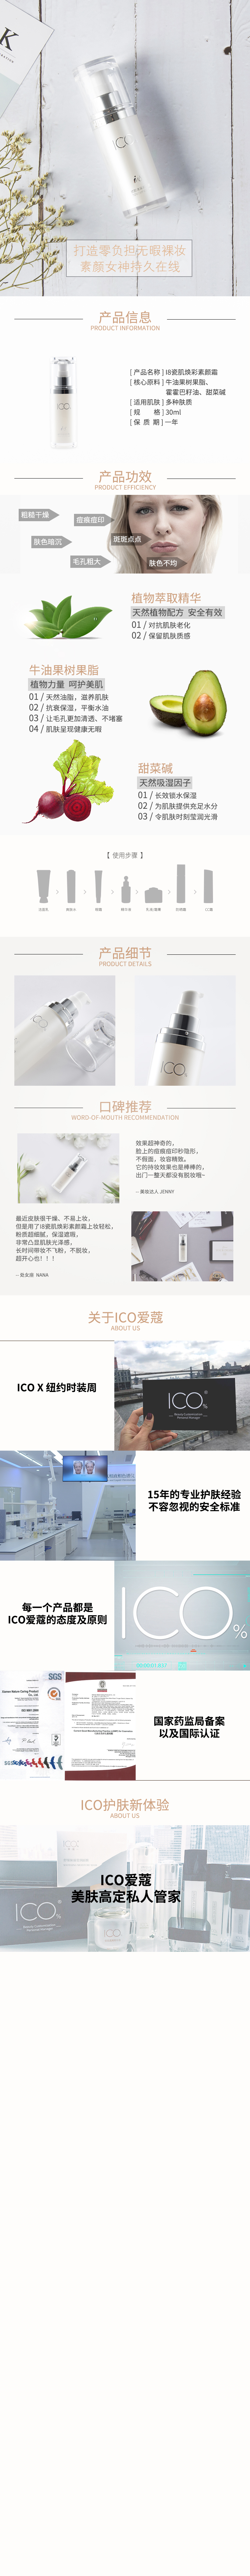 i8素颜霜详情页-新-1.png